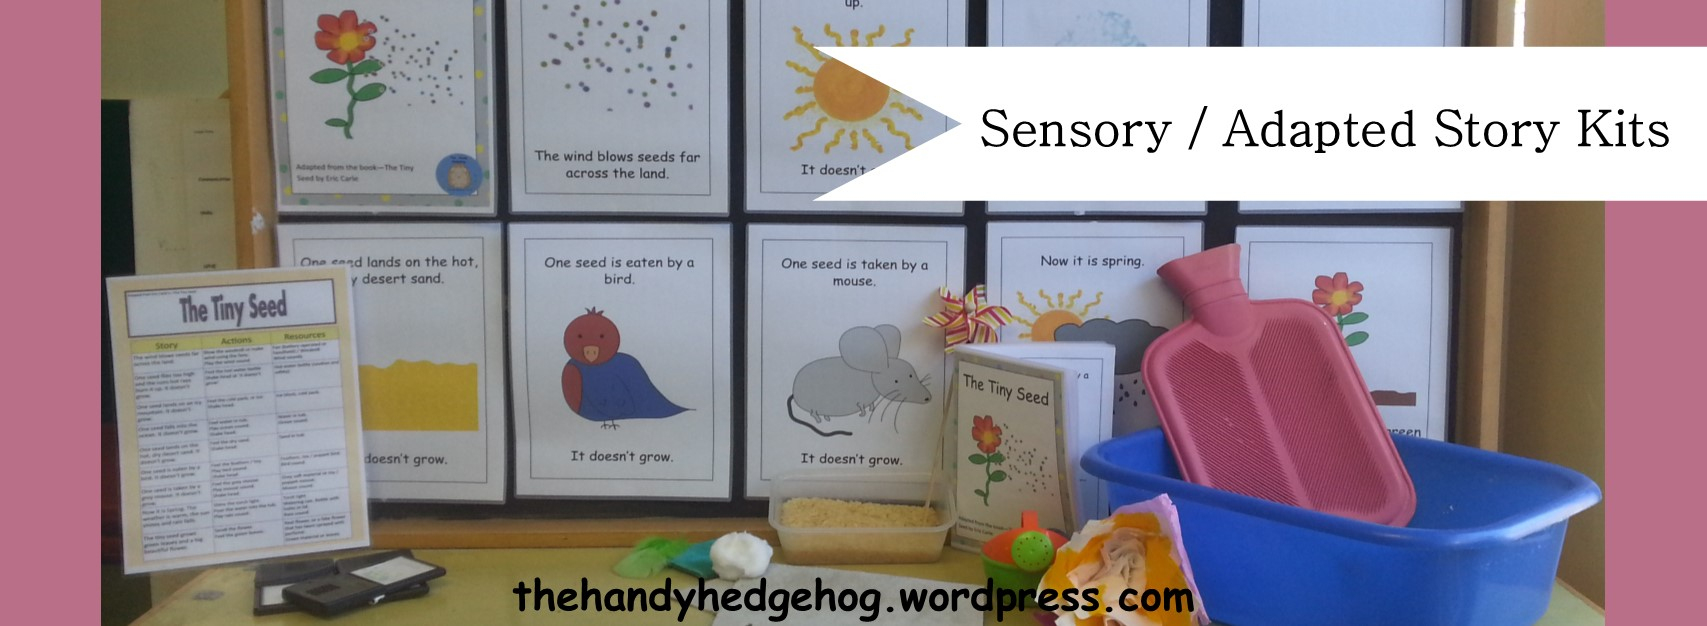 Sensory / Adapted Story Kits – The Handy Hedgehog - Free Printable Sensory Stories